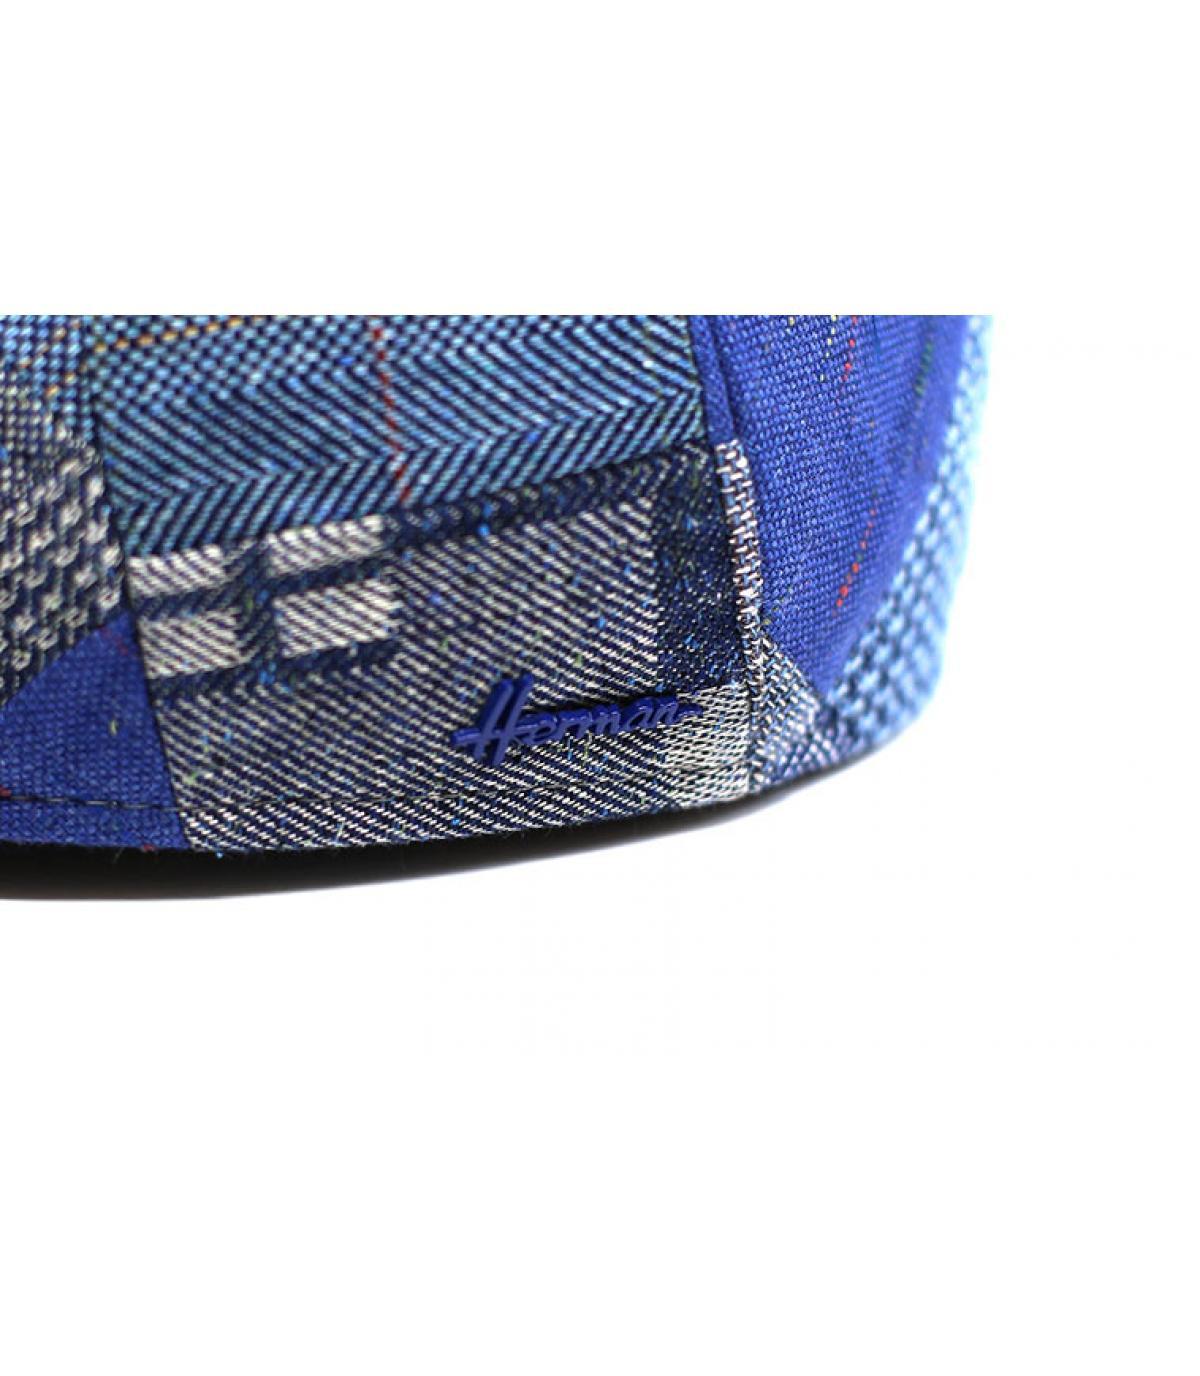 Dettagli Botnie Patch blue - image 3